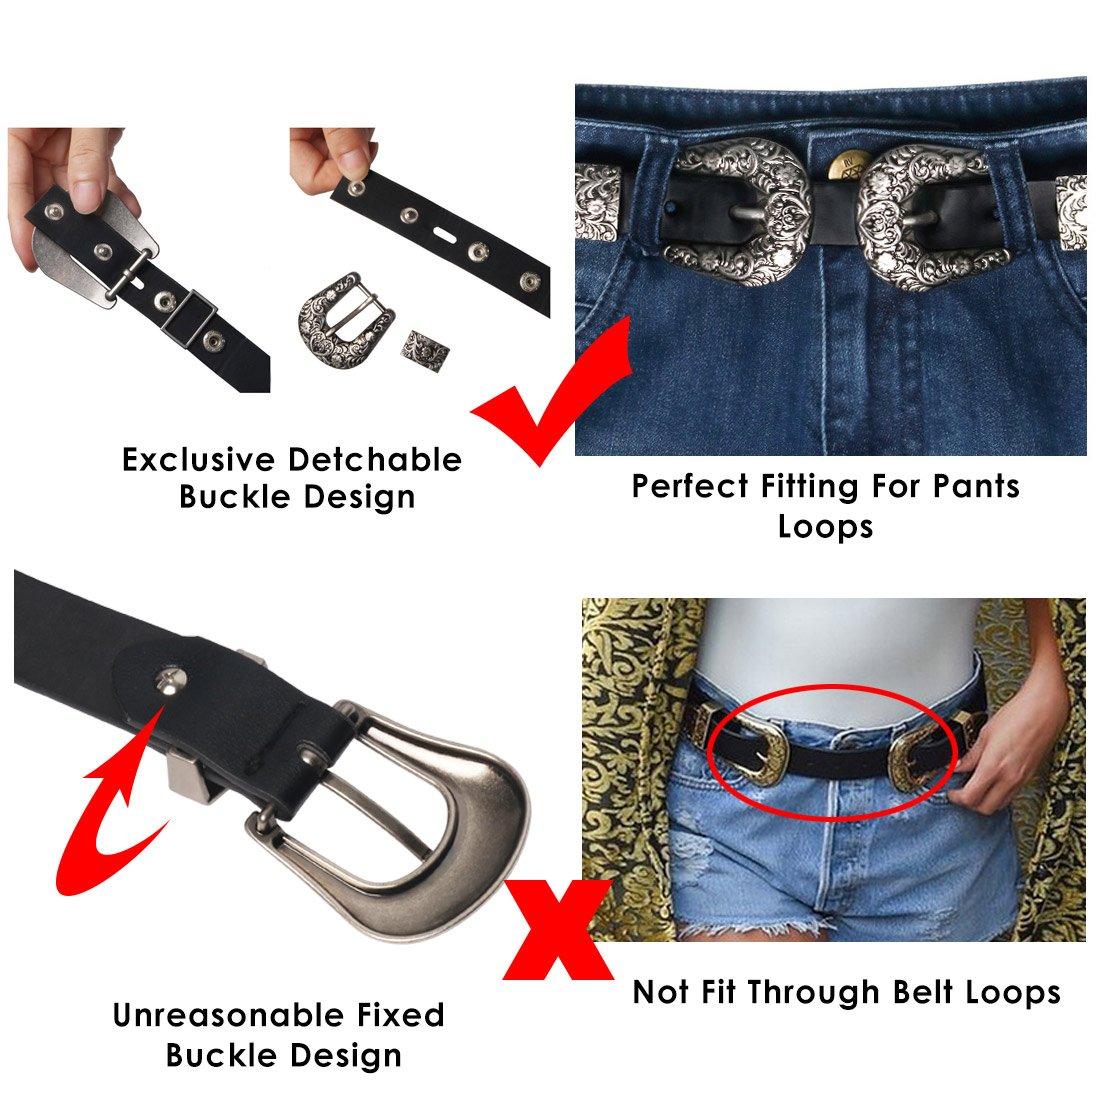 Wink Gal Women's Boho Metal Western Double Buckle Belt Sliver (Suit pants size 31''-34''(US size 12-16), Rivet Width Approx. 1'') by Wink Gal (Image #2)